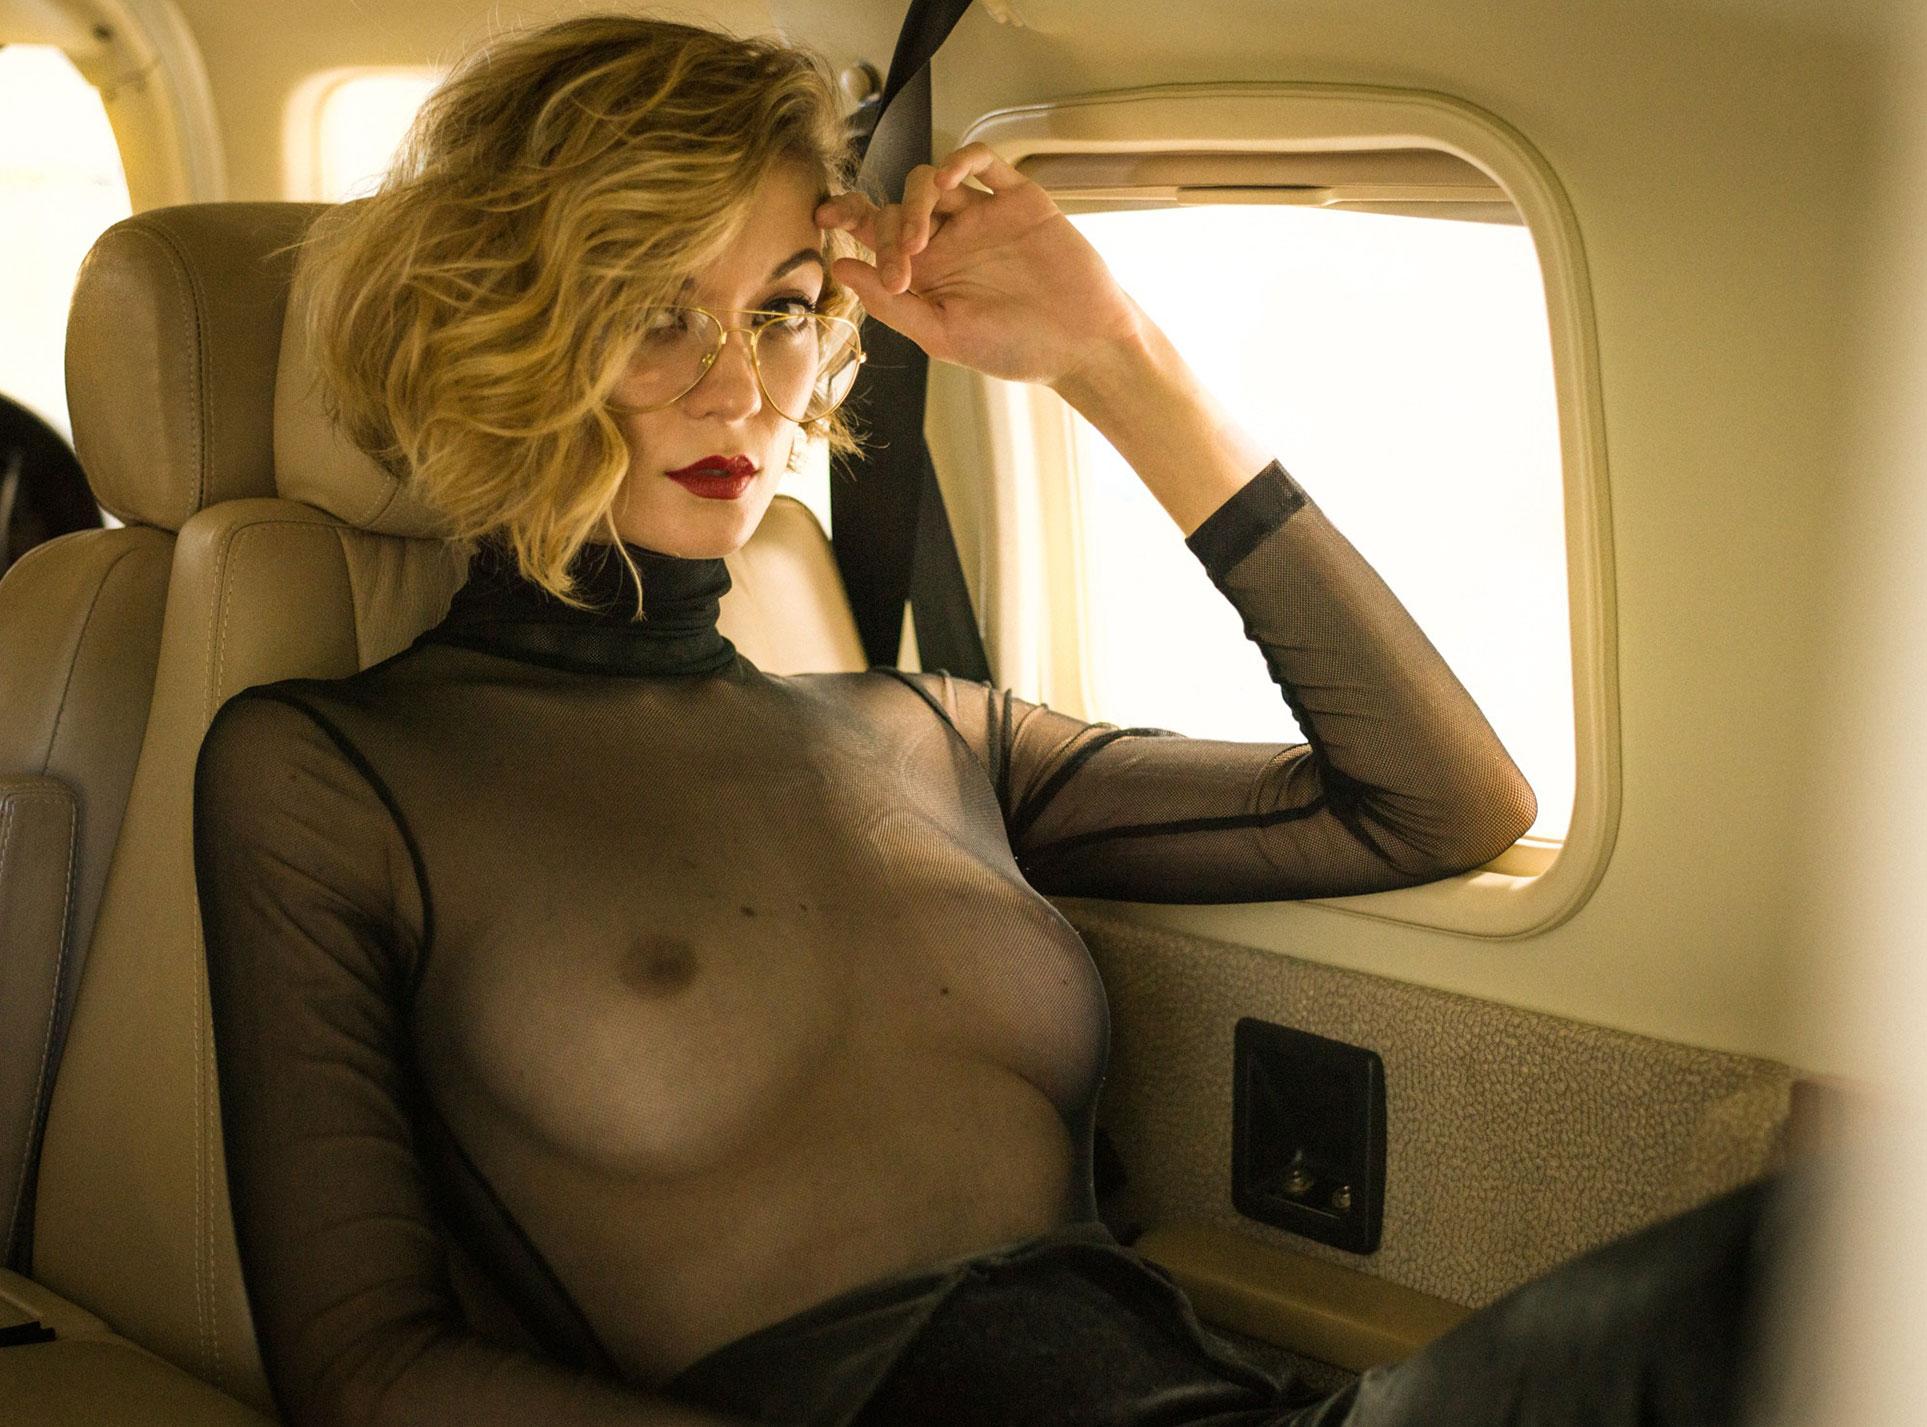 сексуальная угонщица самолета Анна-Лиза / фото 08